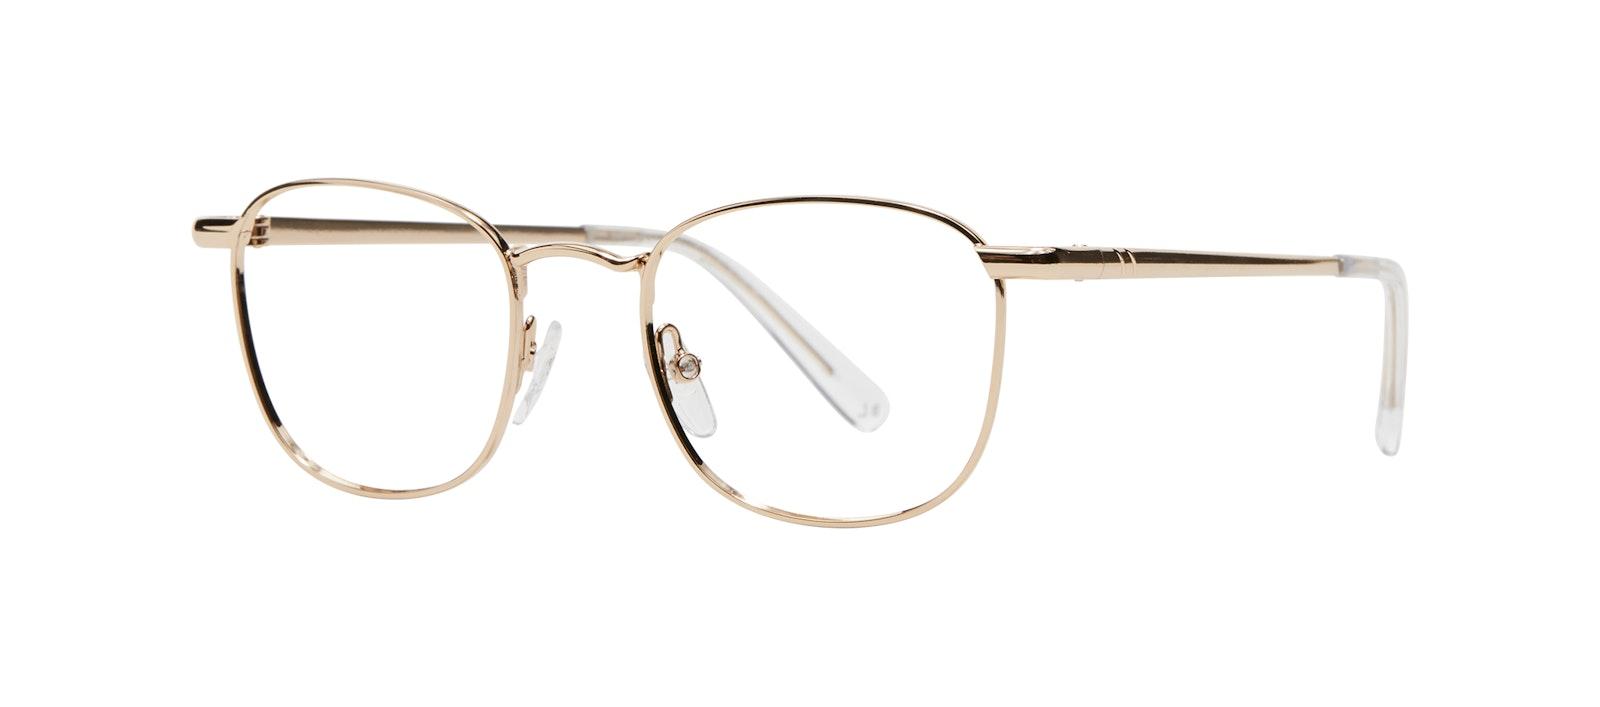 Affordable Fashion Glasses Square Eyeglasses Men Apex S Gold Tilt